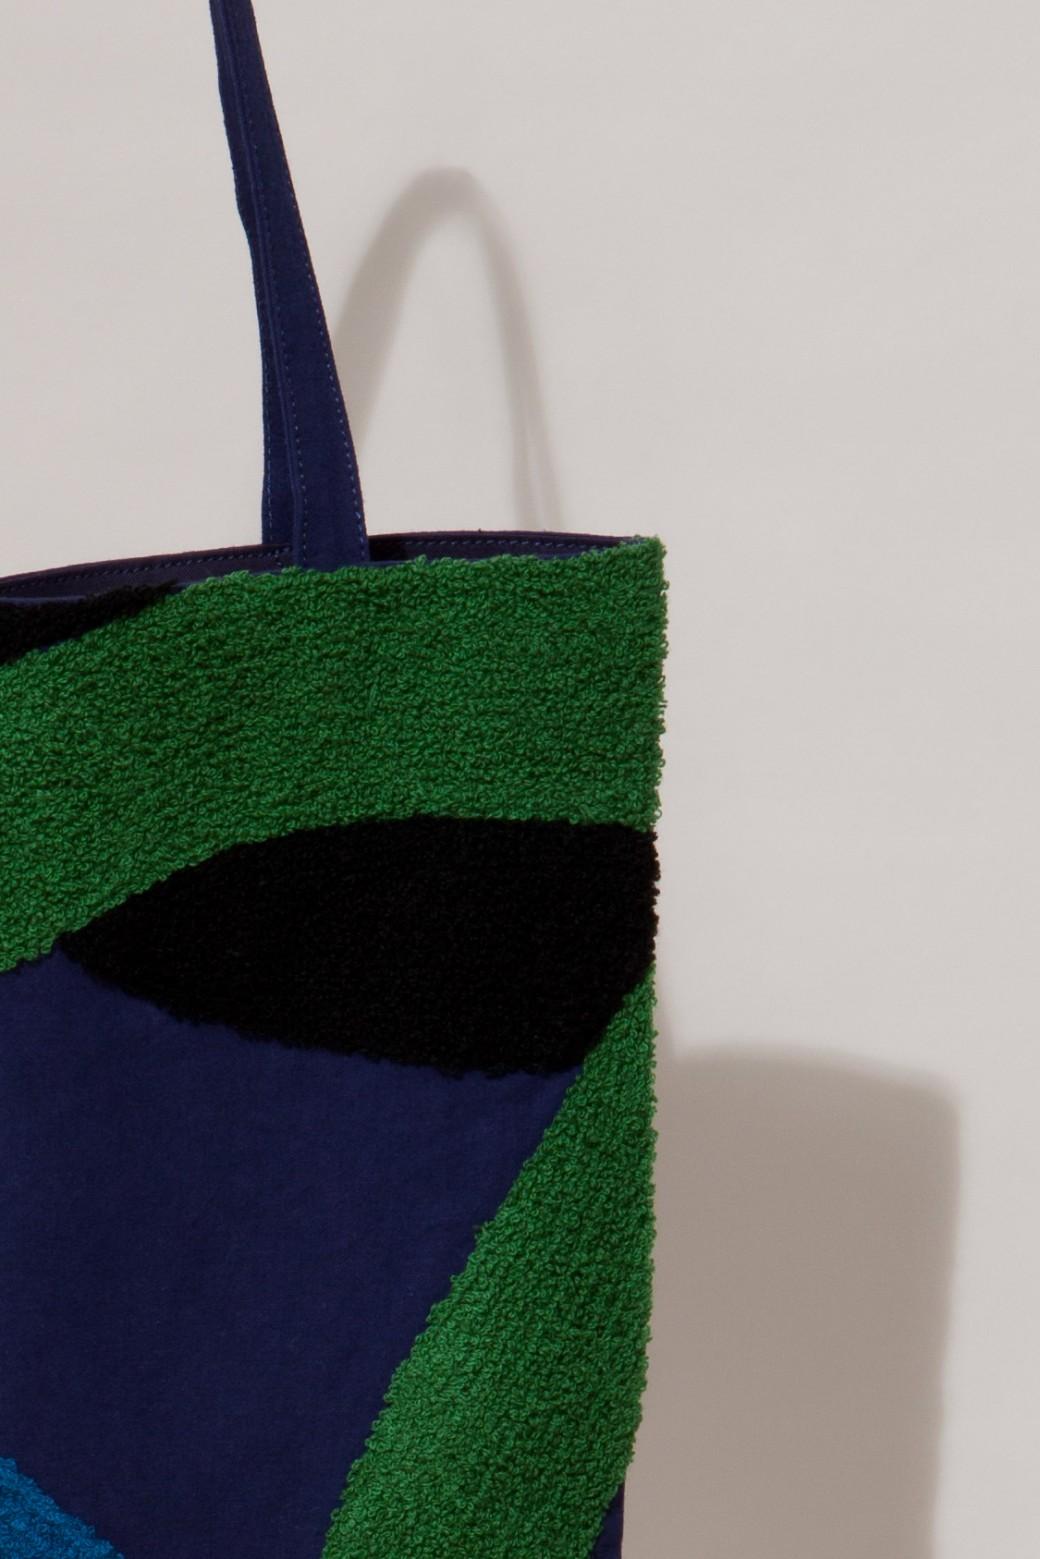 PRELUDE BLUE GREEN TOTE BAG